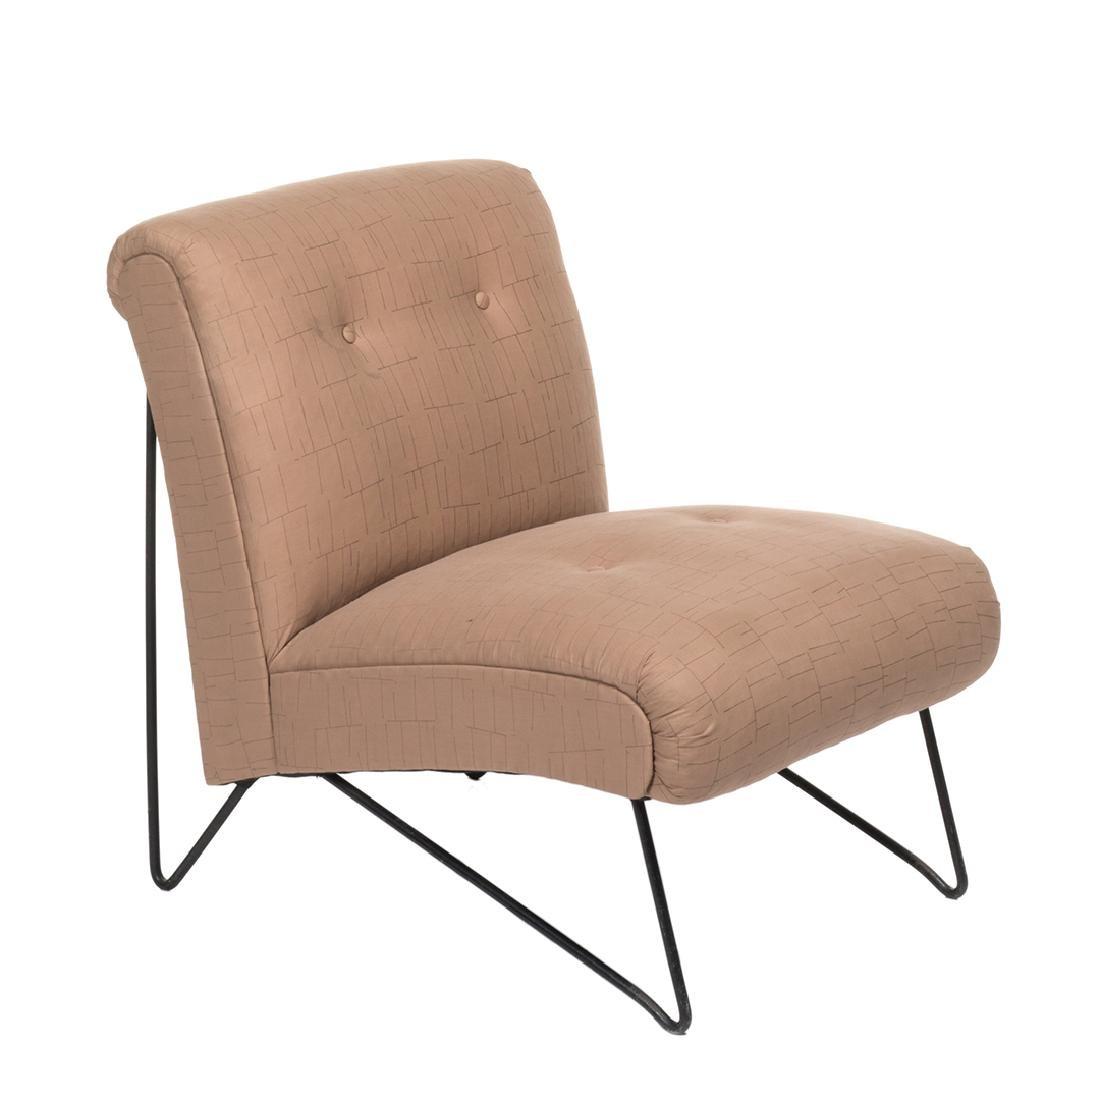 Hairpin Leg Slipper Chair